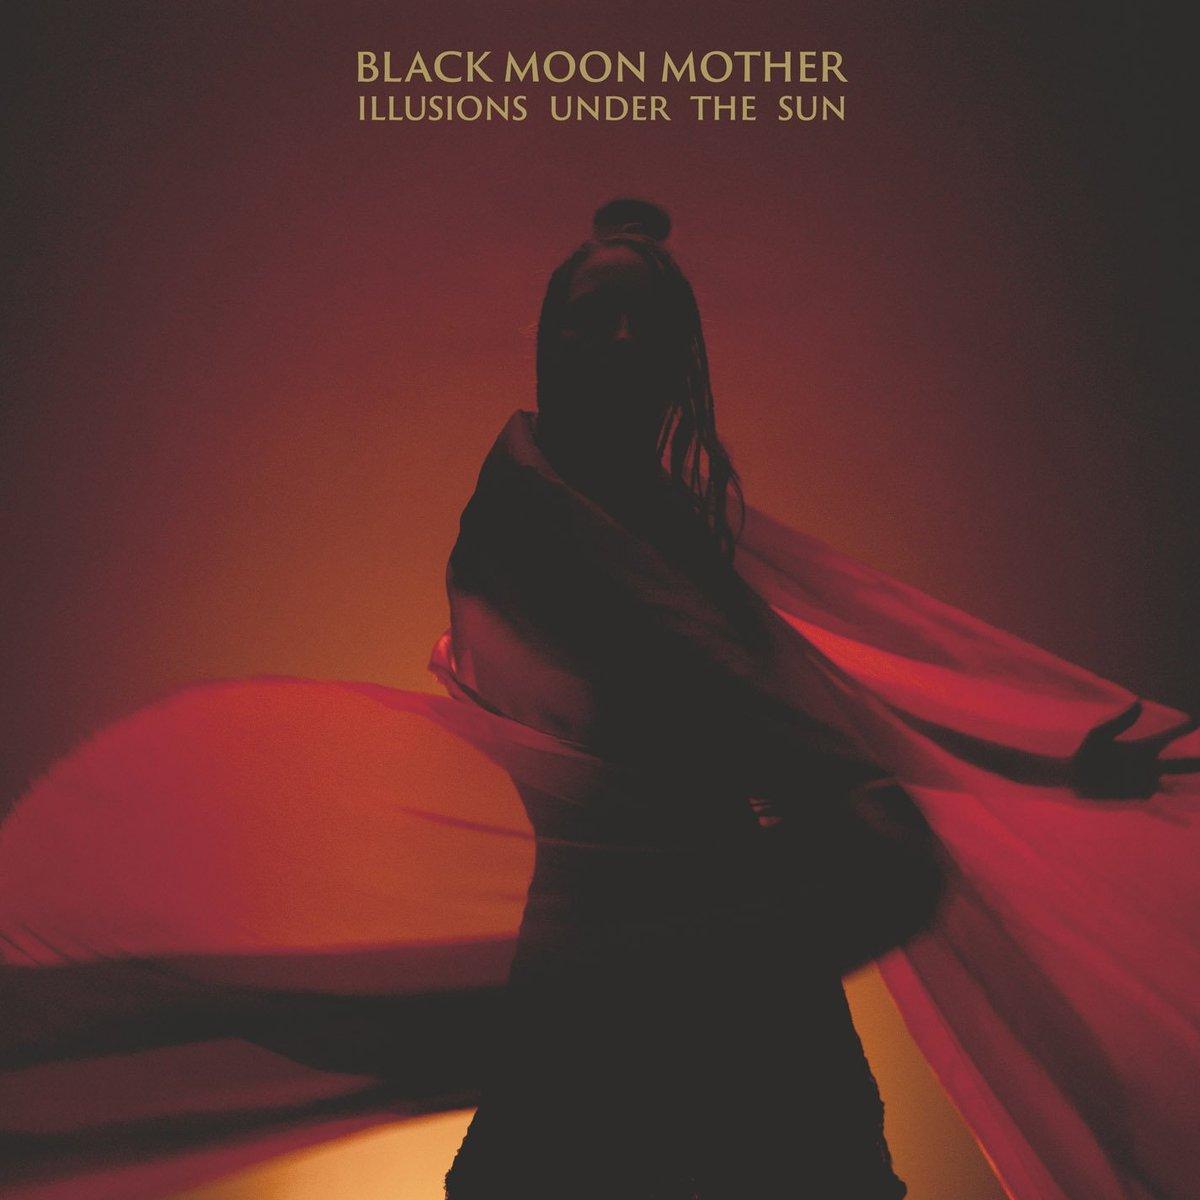 BLACK MOON MOTHER - ILLUSIONS UNDER THE SUN CD (SLIP CASE)